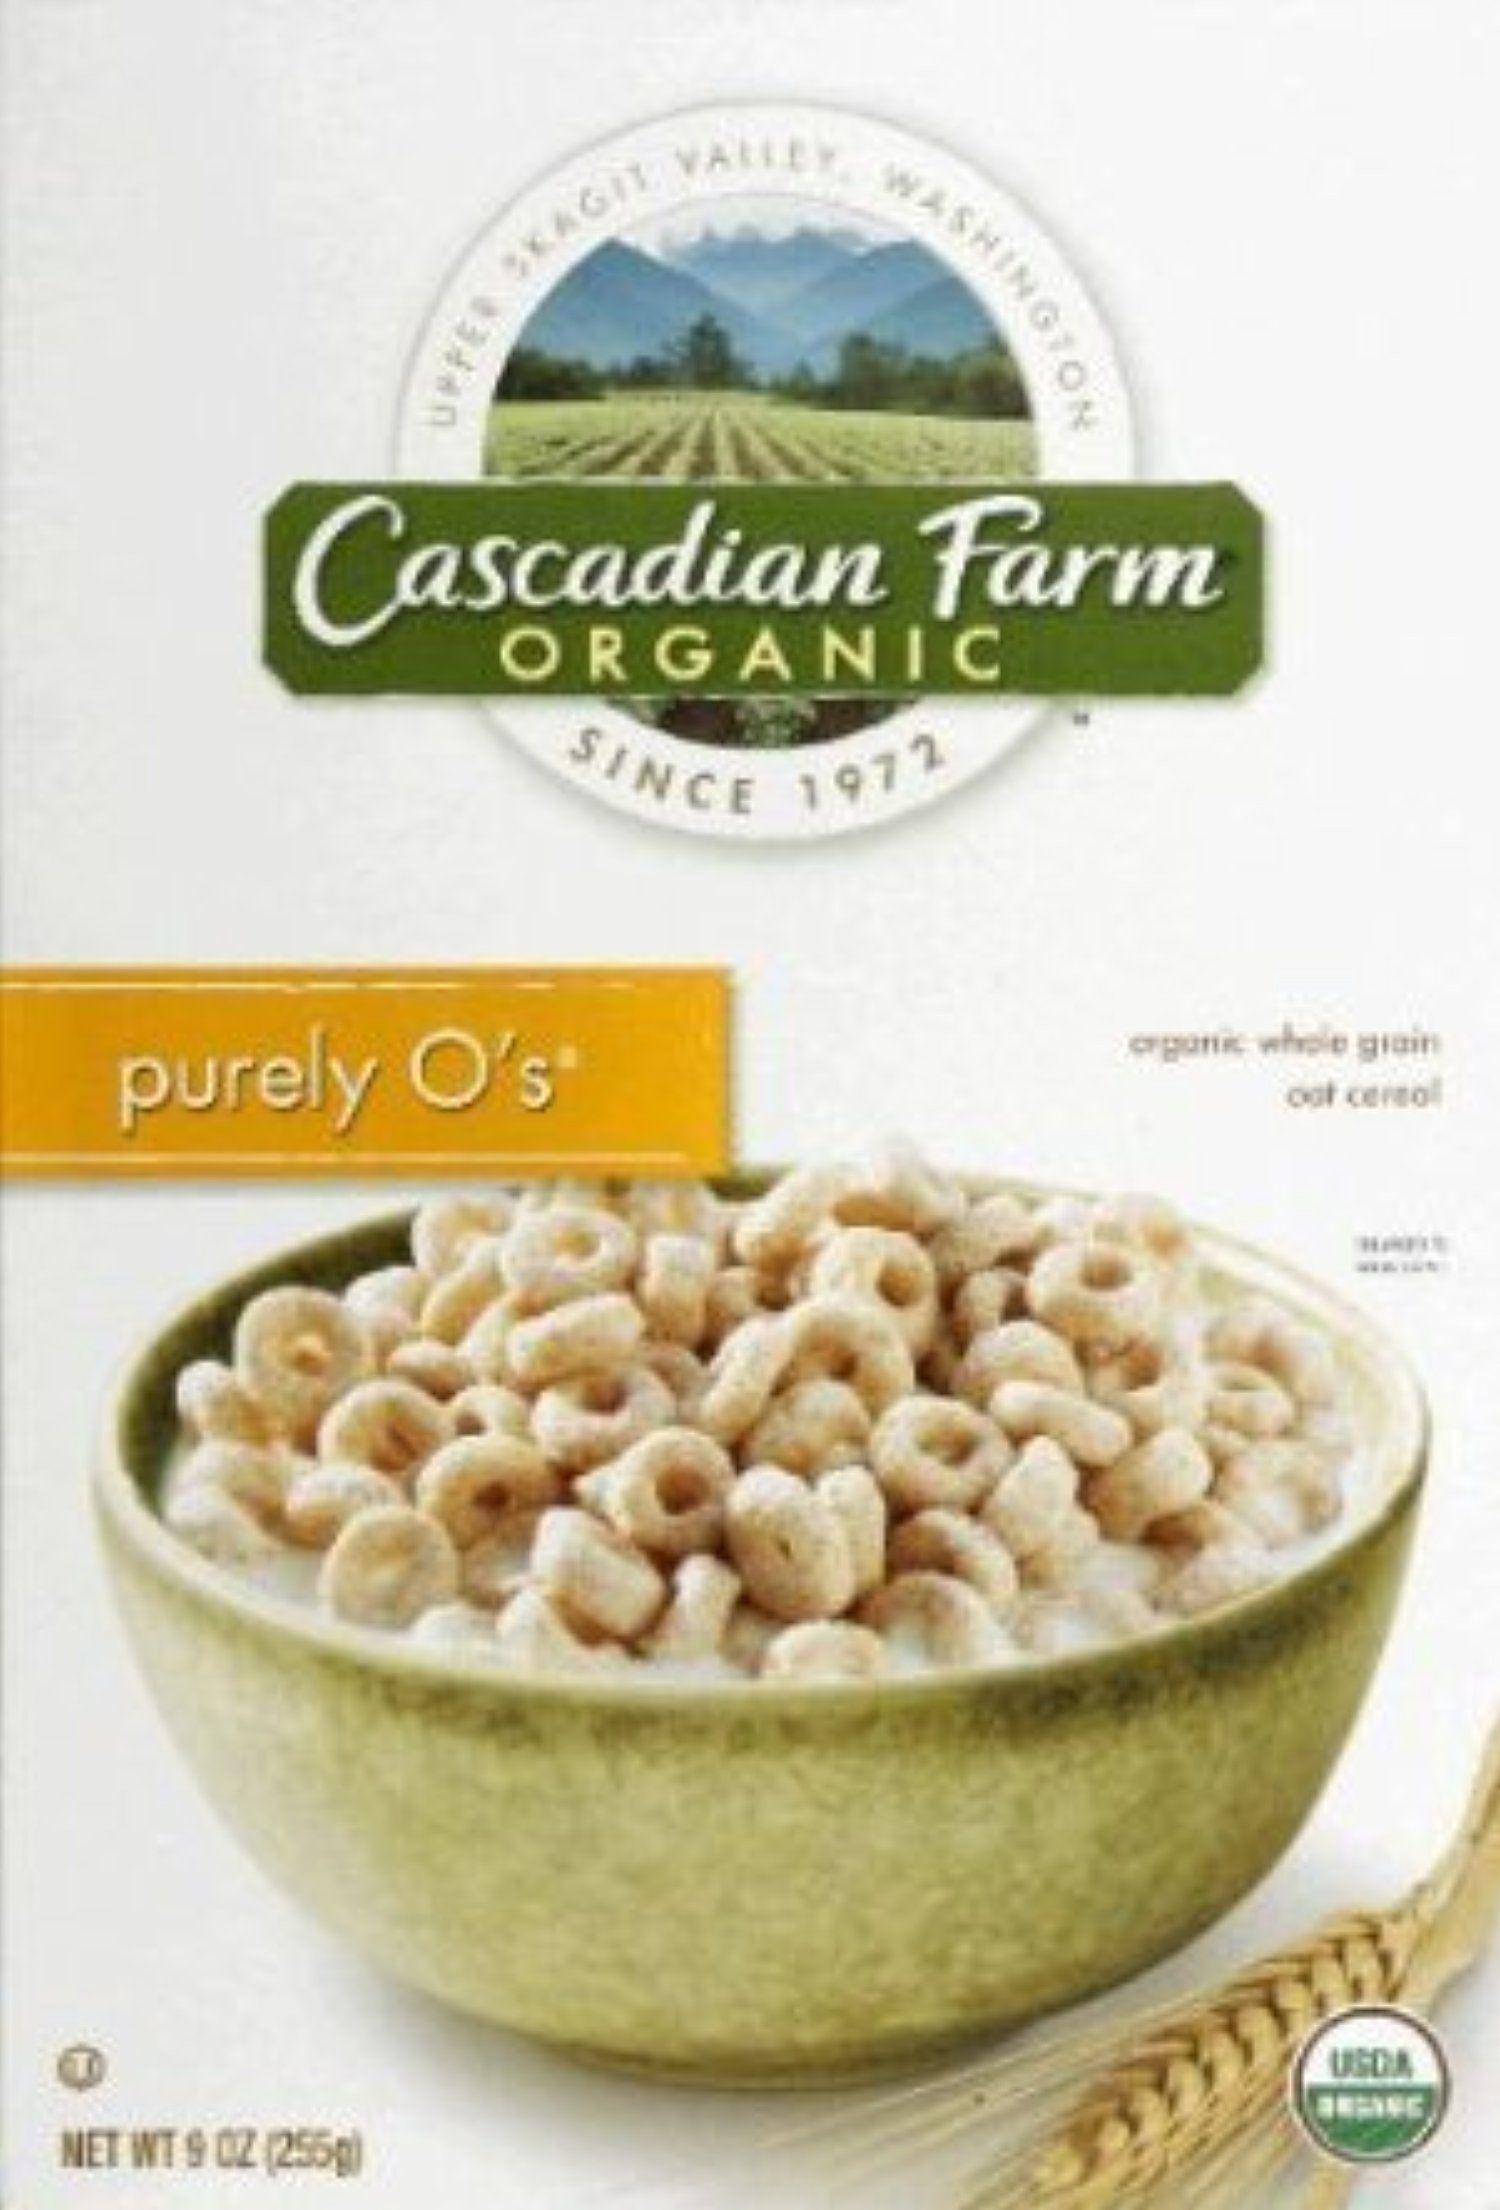 Cascadian Farm Organic Purely O's Cereal, 8.6-ounce Boxes (Pack of 2) by Cascadian Farm Organic -- Awesome products selected by Anna Churchill